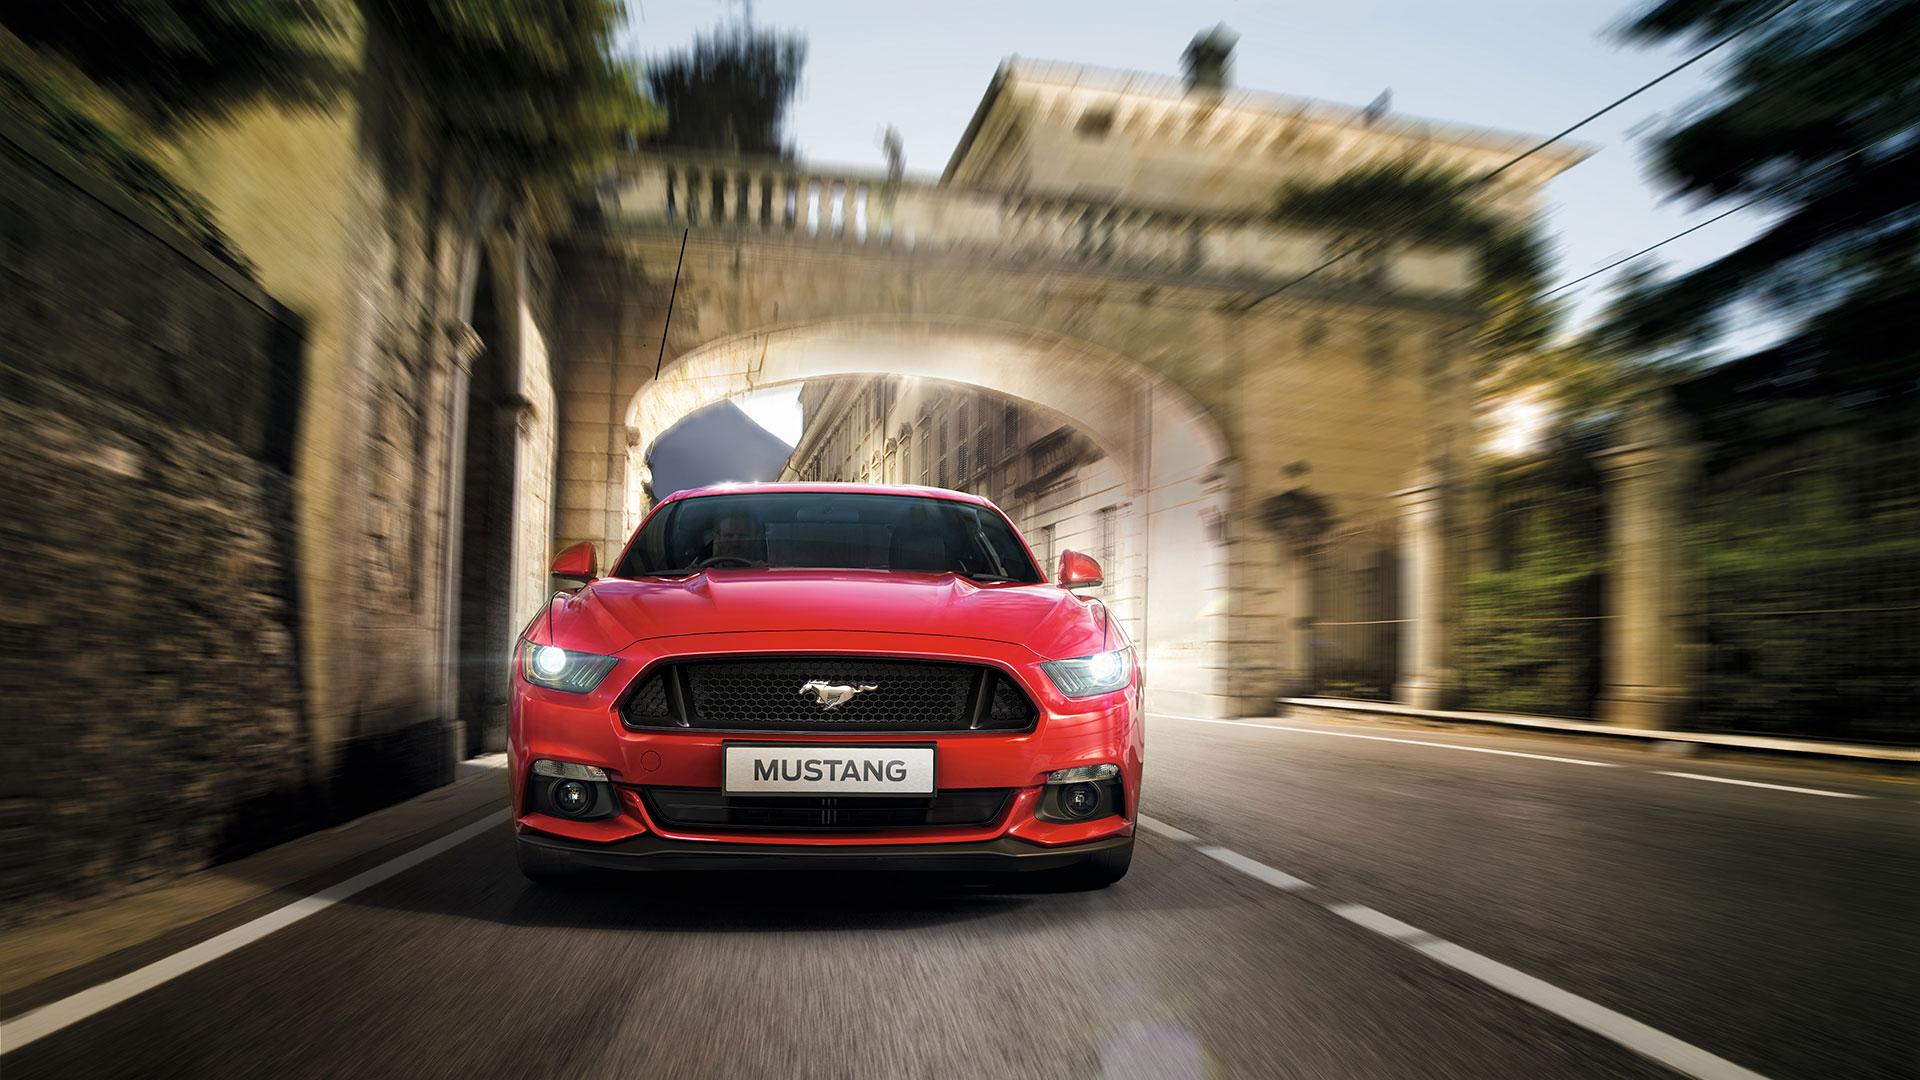 Most Inspiring Wallpaper Logo Ford Mustang - Ford-Mustang-Wallpaper-053  Collection_142187.jpg